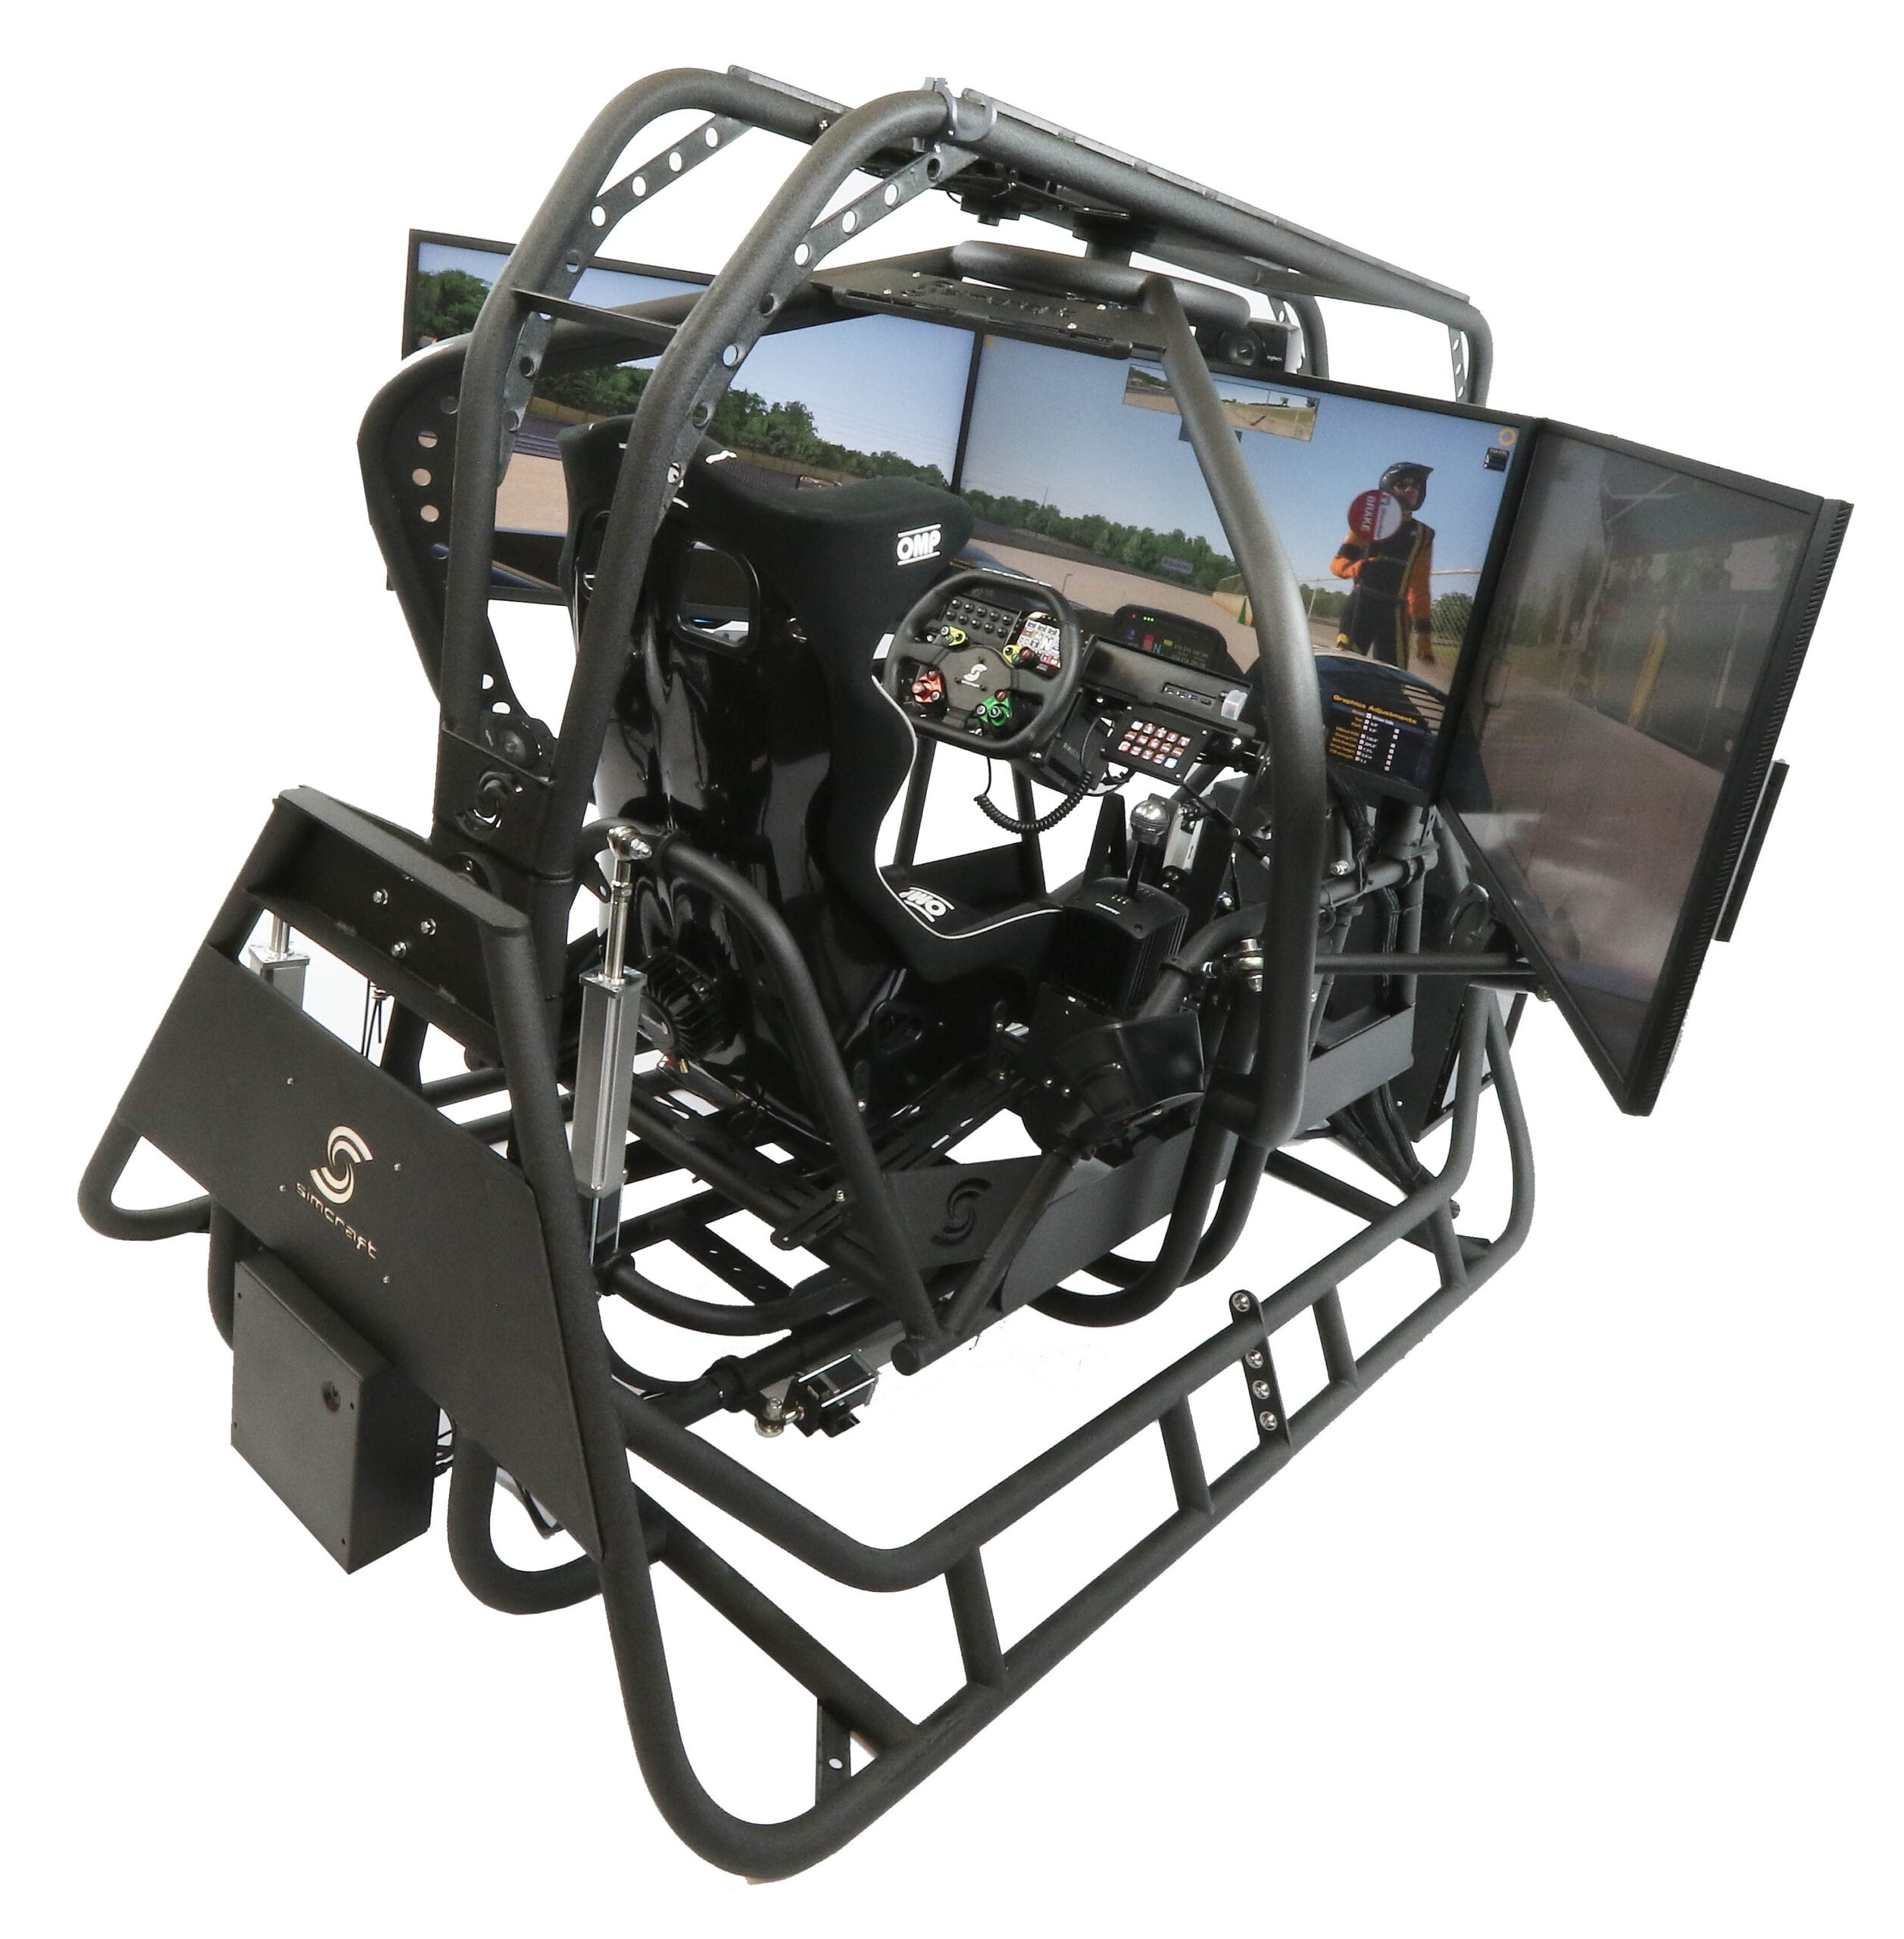 APEX3 3dof pro racing simulator